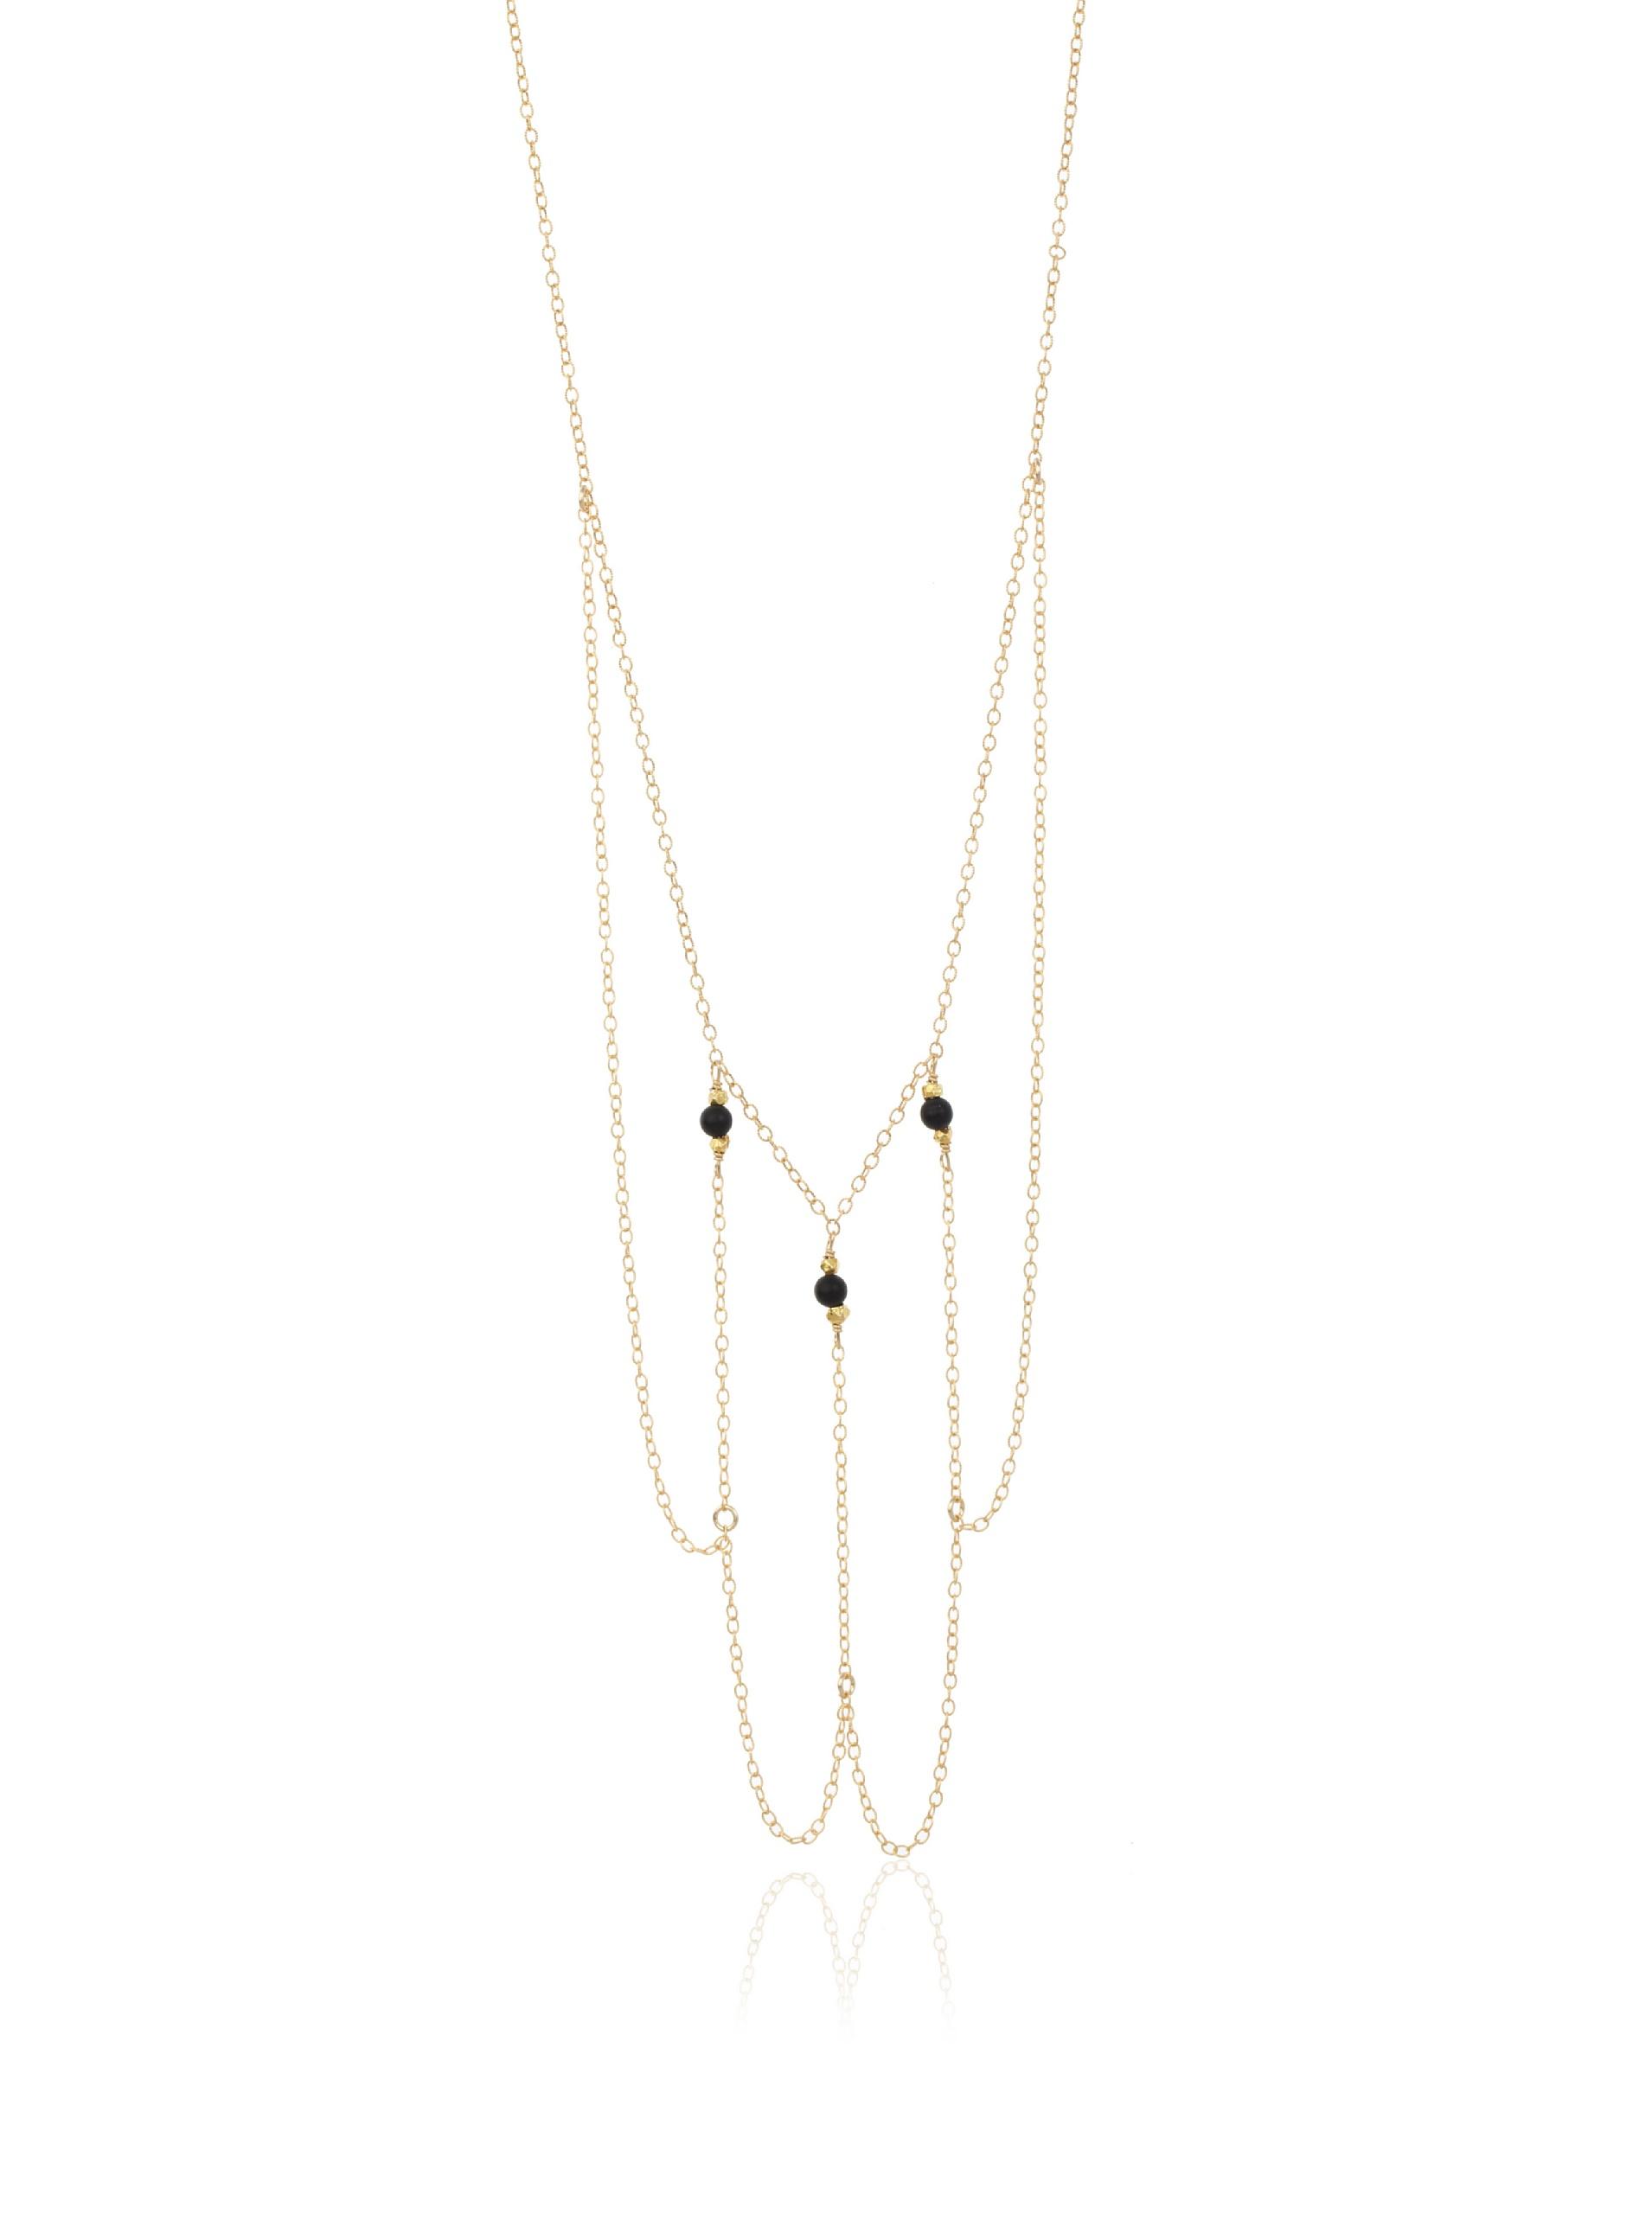 gorjana Black Onyx Capri Long Layered Necklace